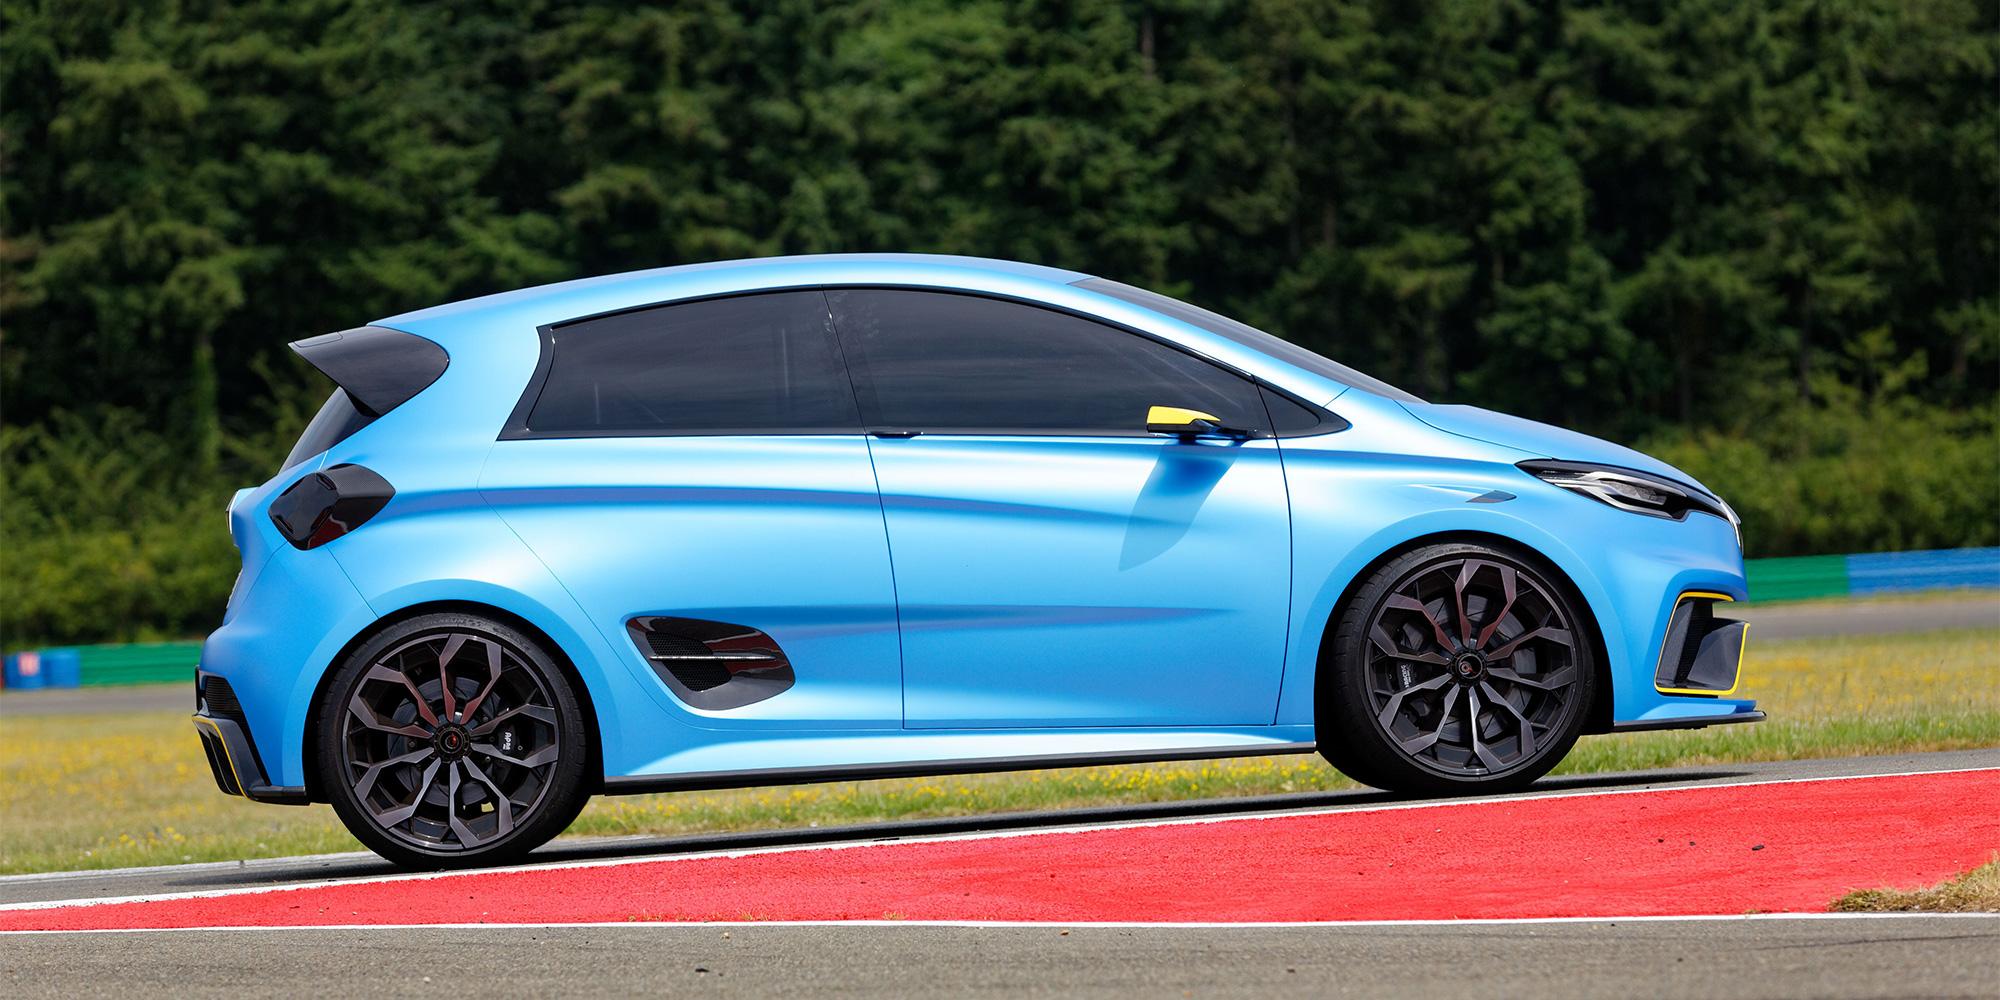 E Racer Auto Bild Testet Renault Zoe E Sport Concept Renault Welt